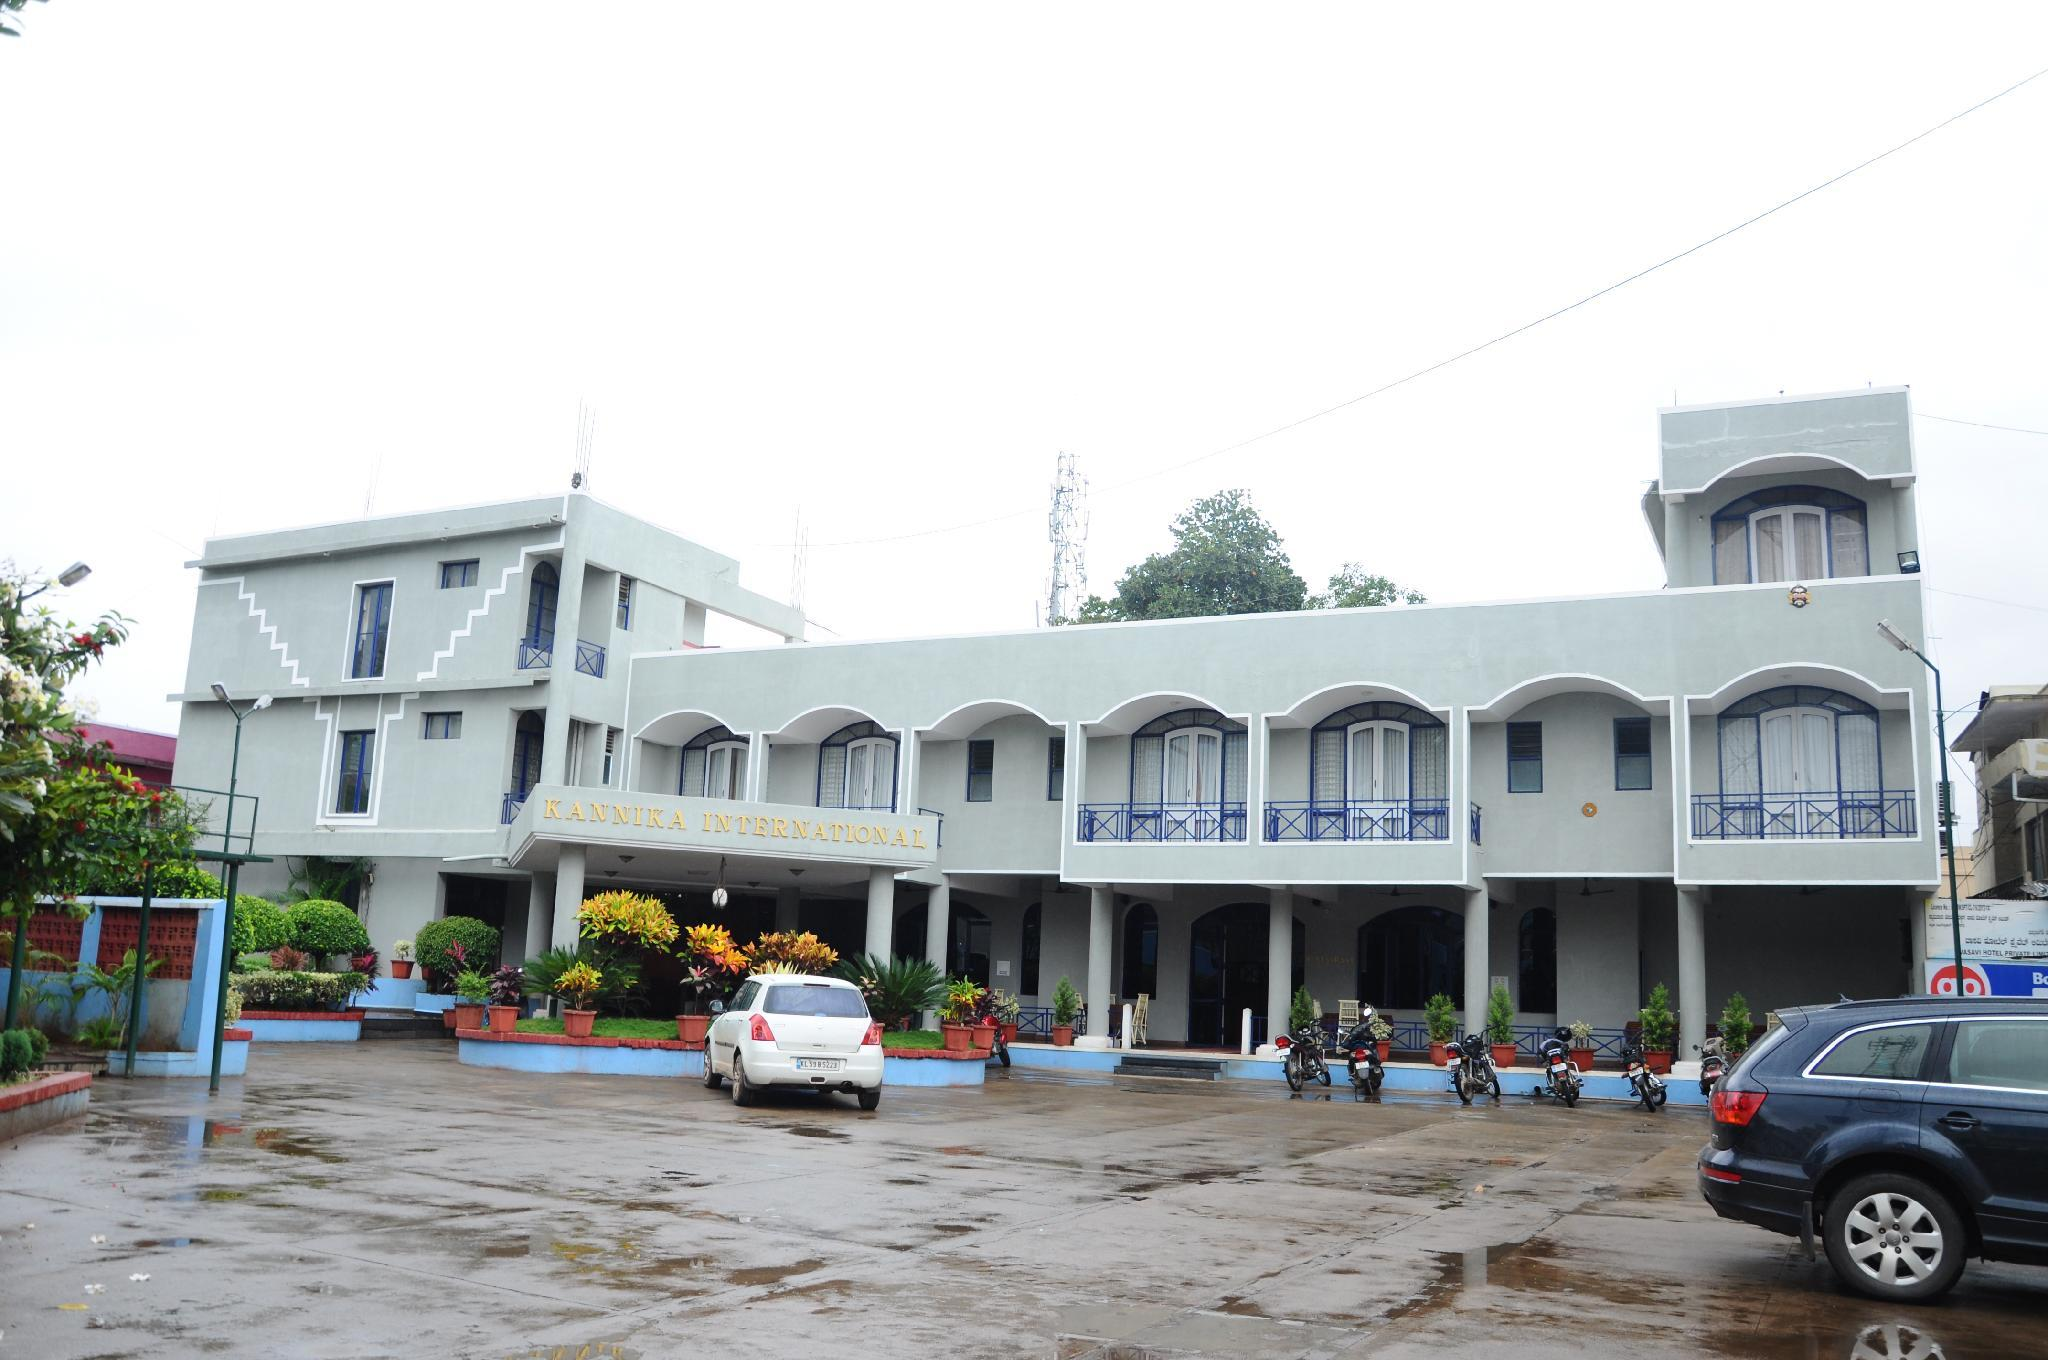 Hotel Kannika International